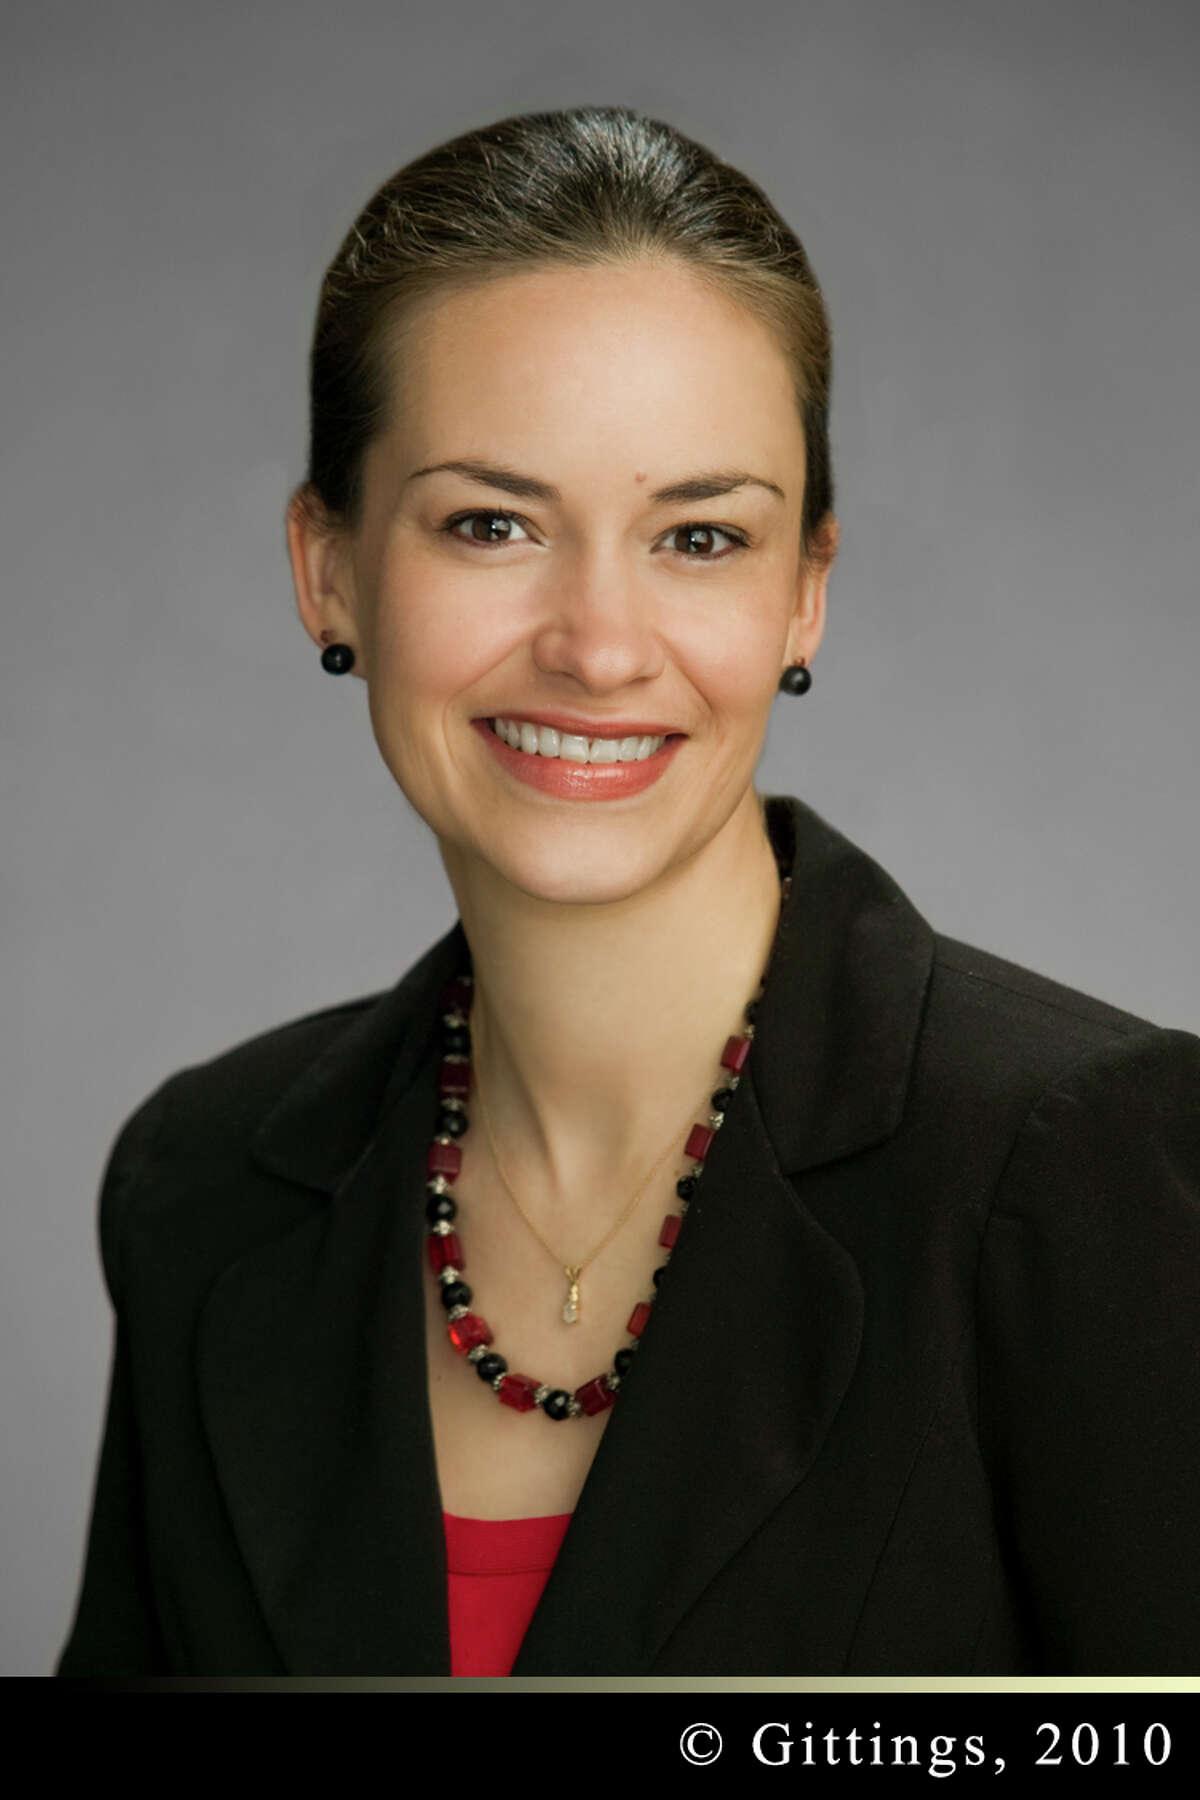 Michelle Hundley